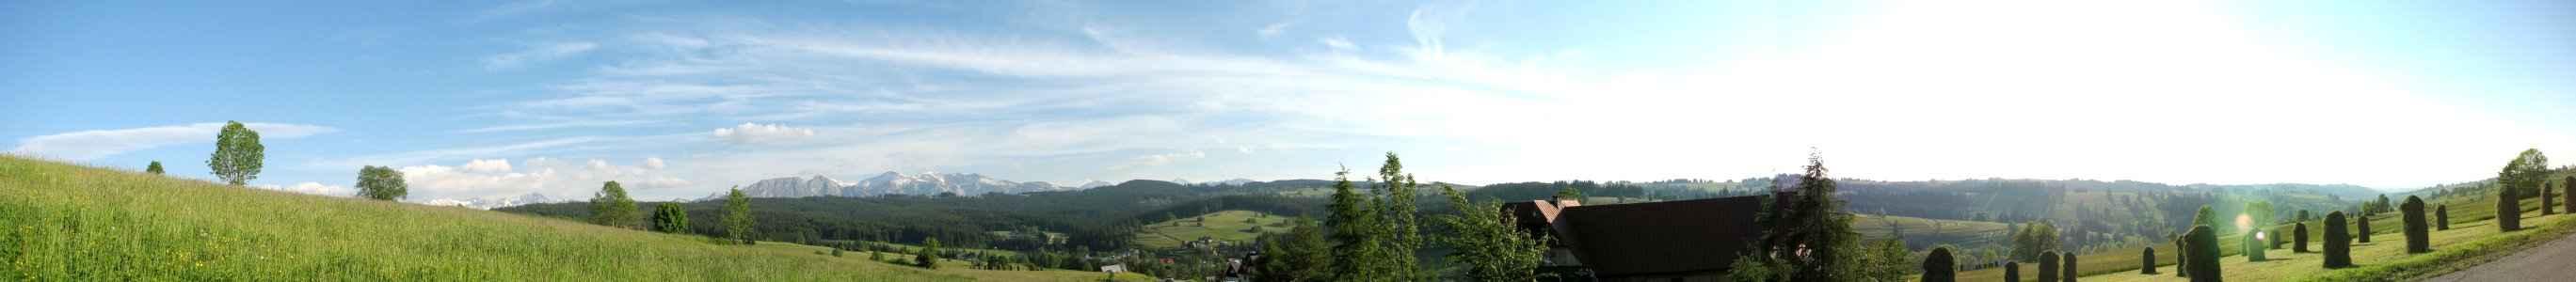 panorama_15_06_2005